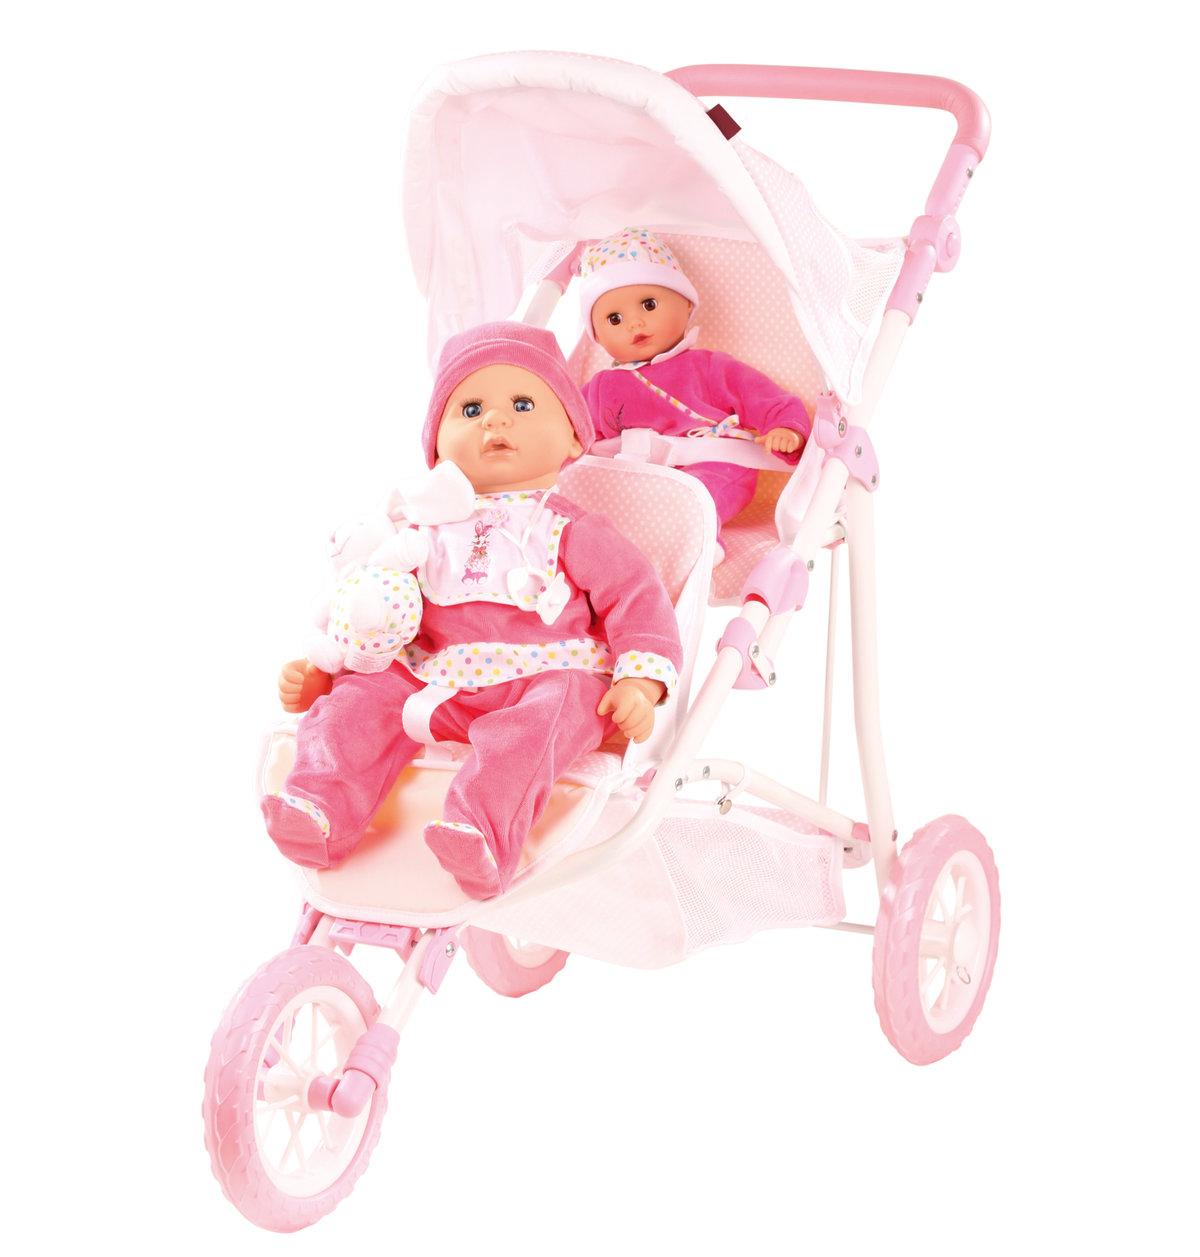 Картинки коляска для кукол двойняшек, днем